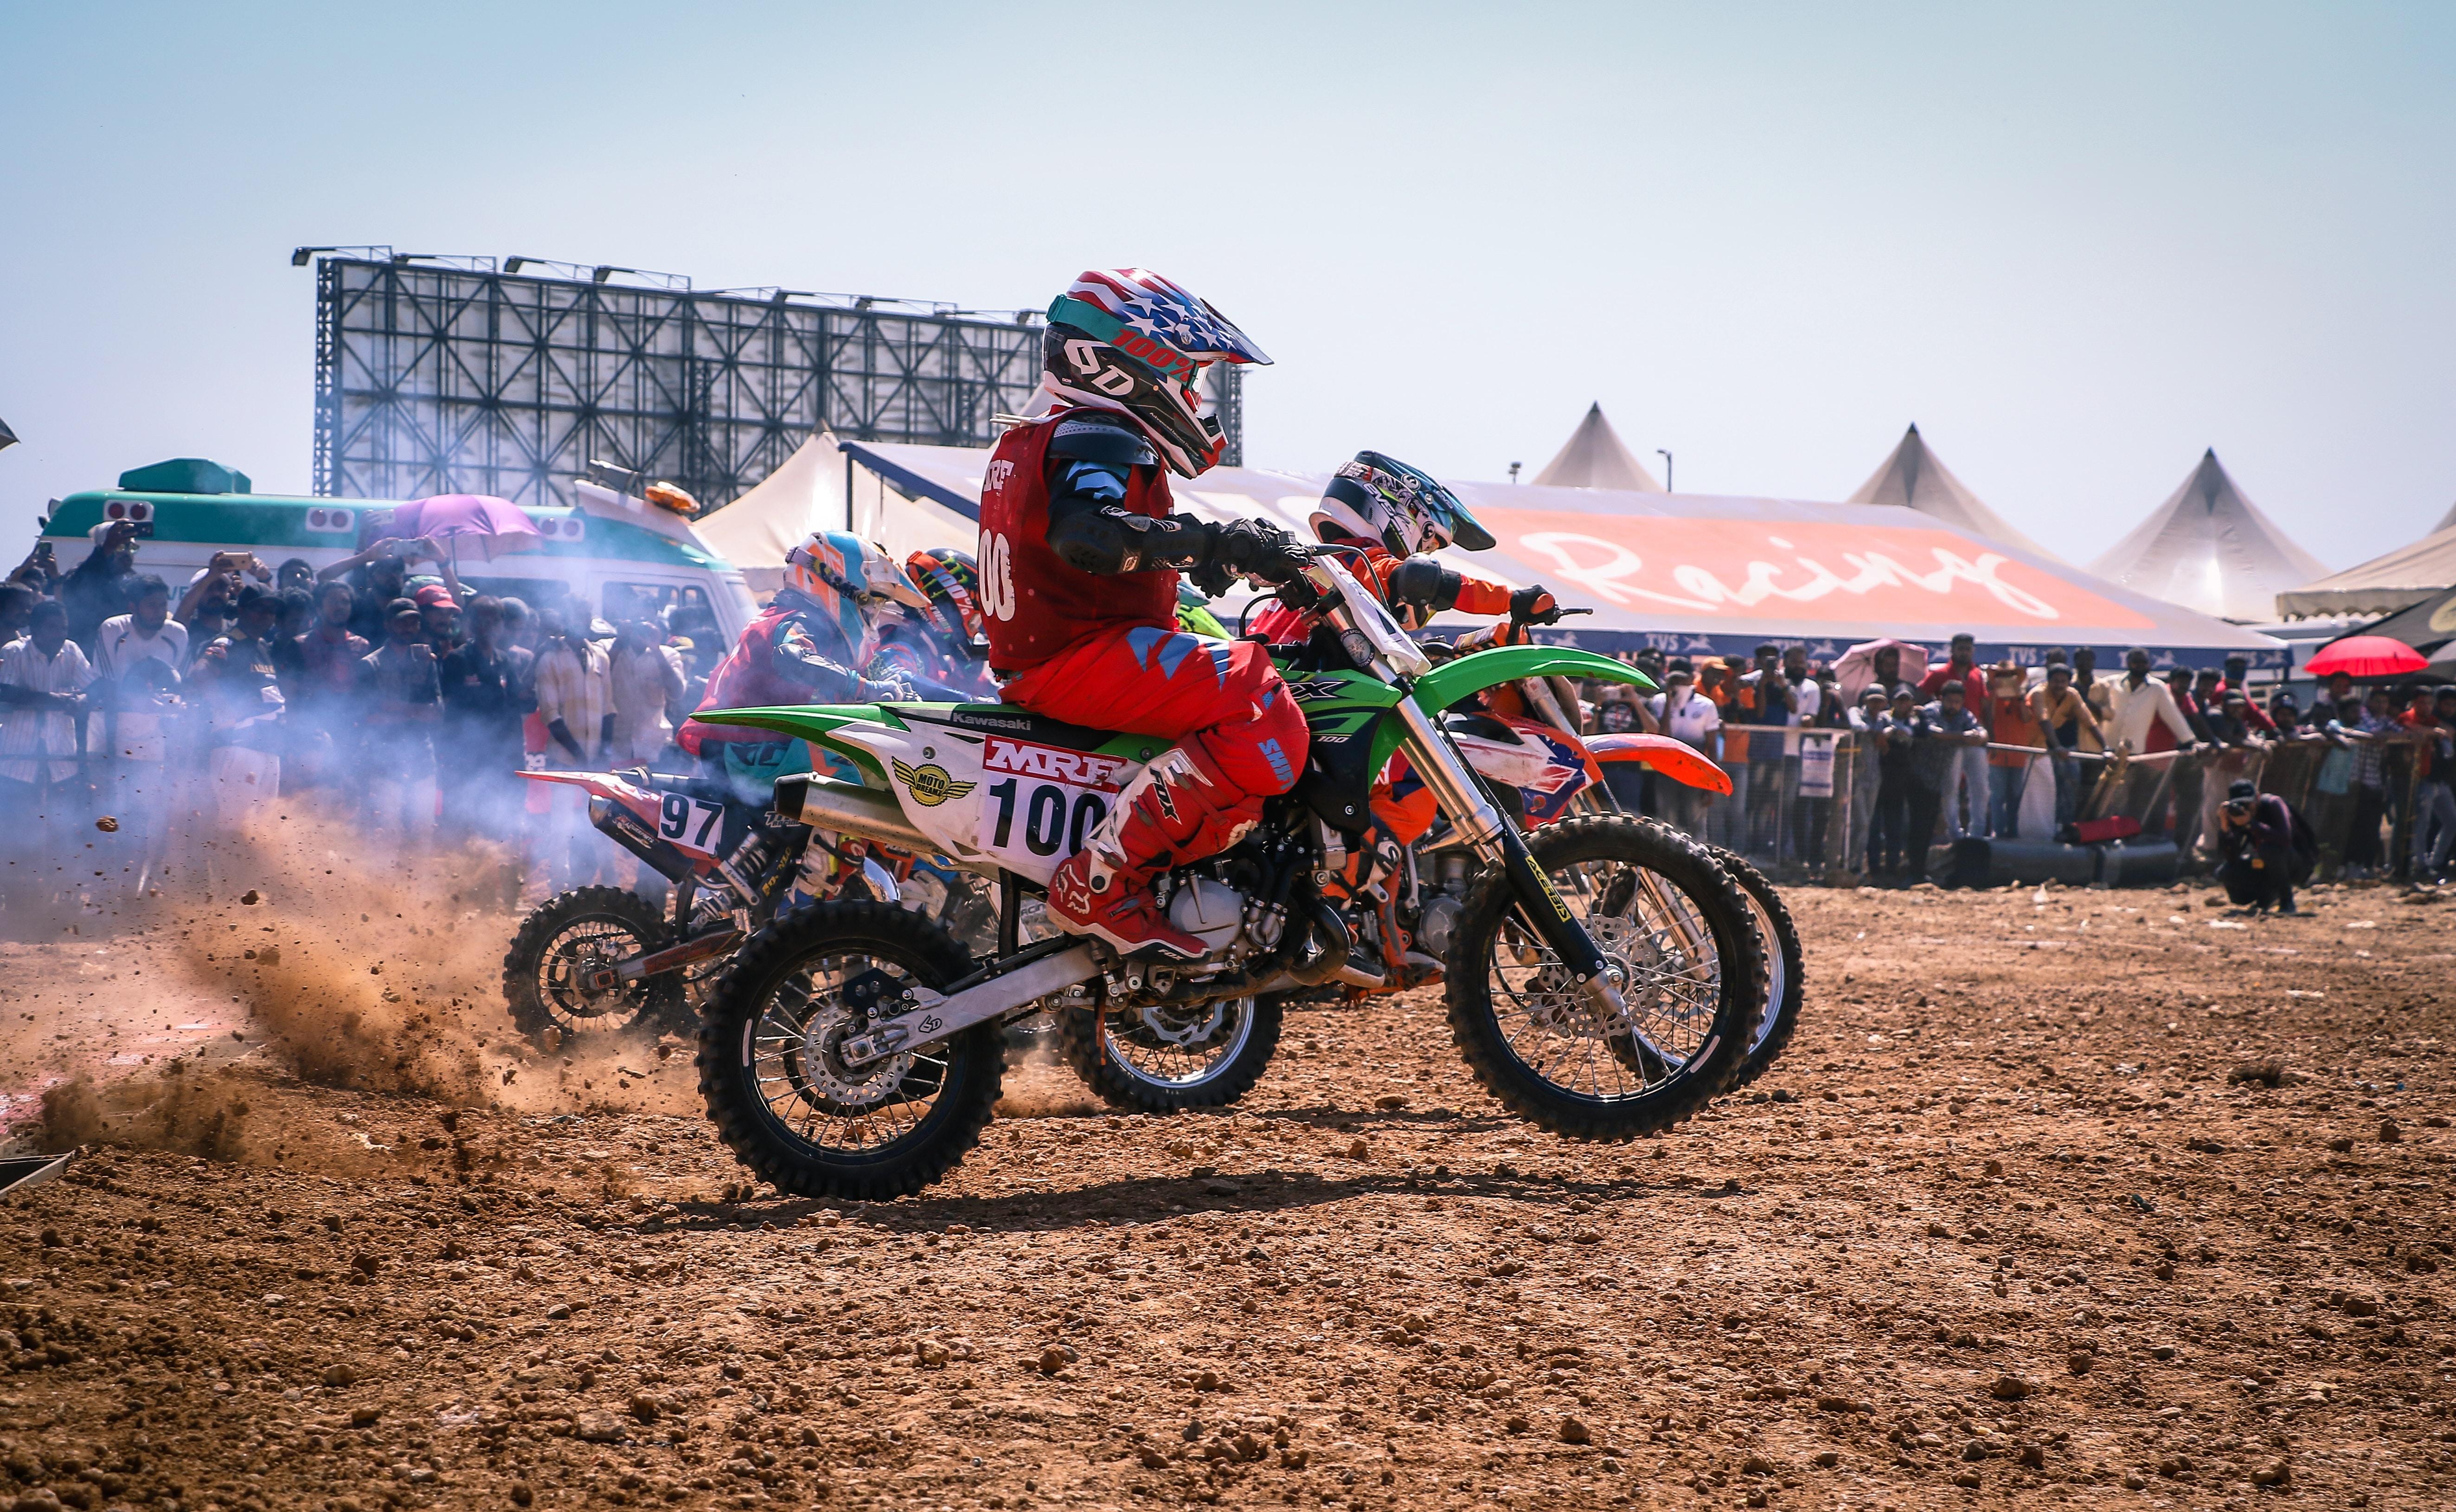 motocross dirt bike racing with people watching beside on focus photo